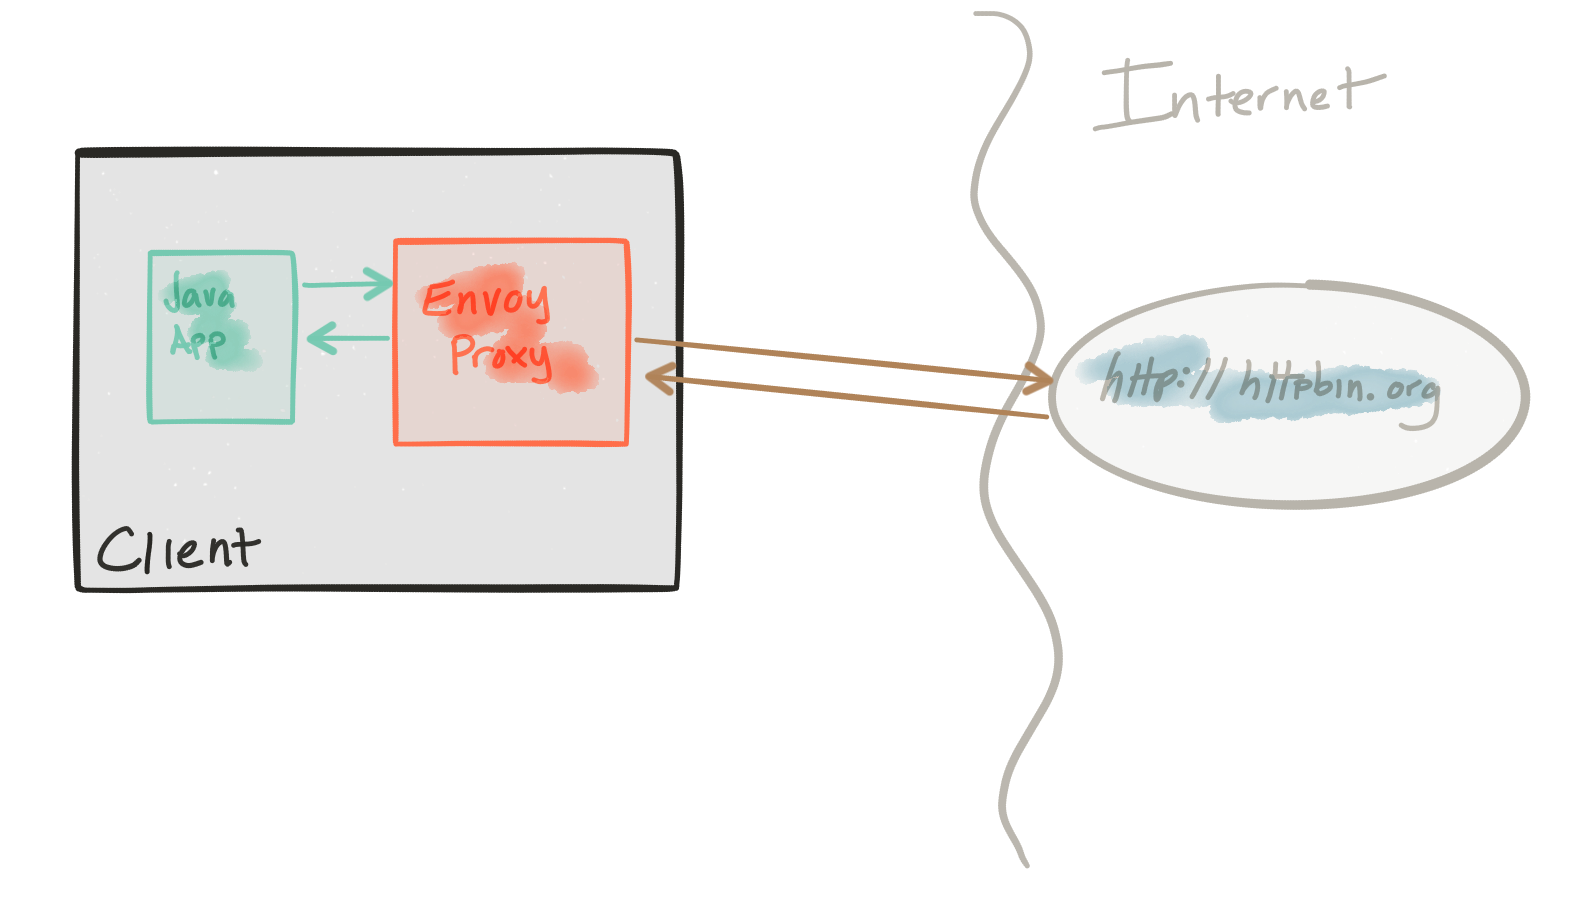 envoy-demo-overview